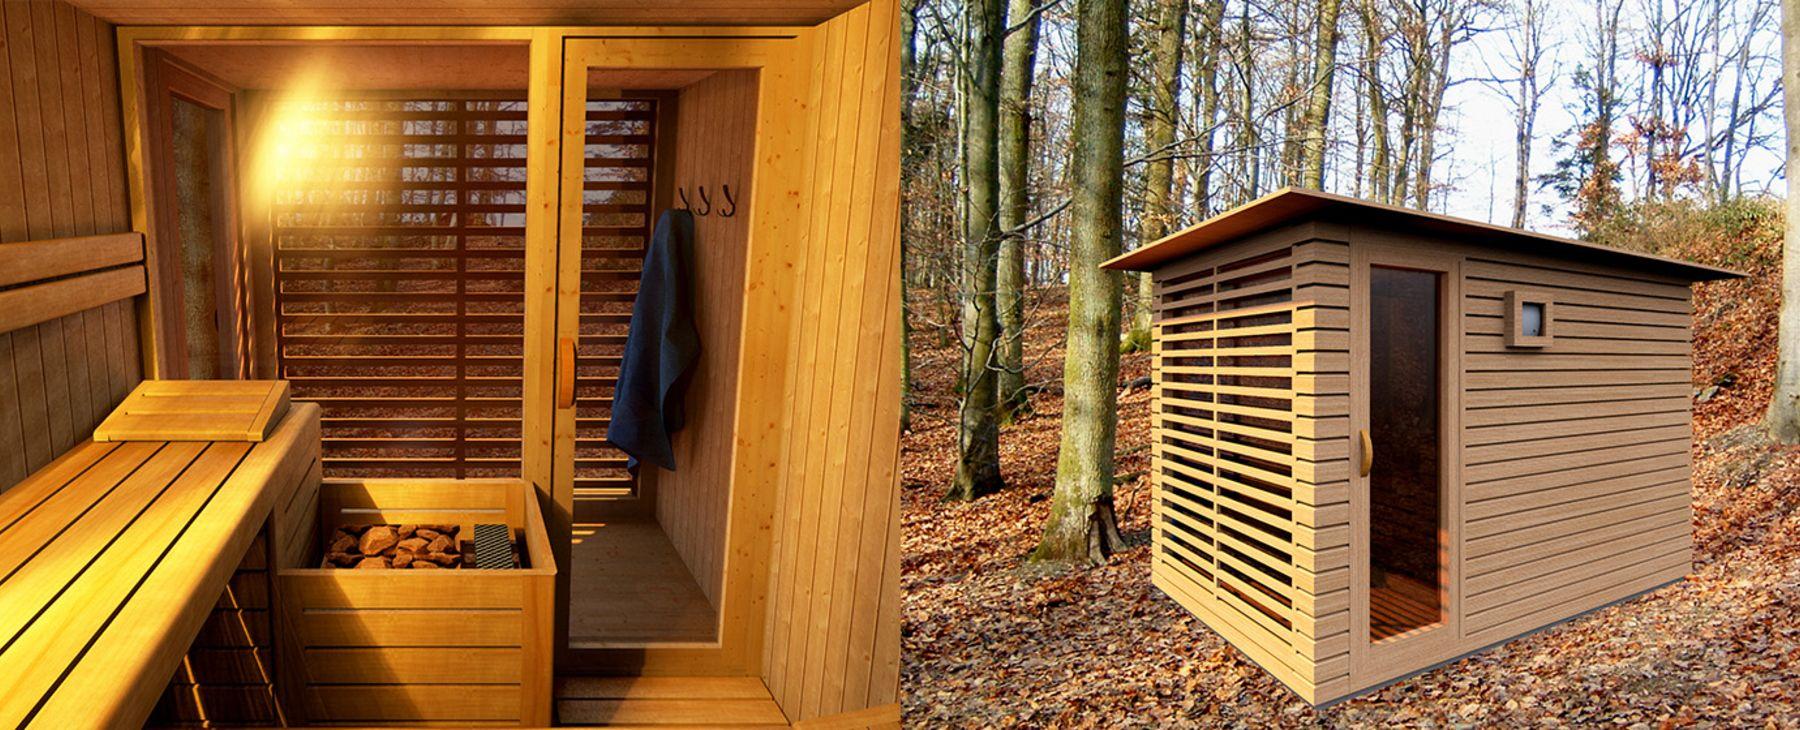 sauna schaller fotorealistische 3 d planung. Black Bedroom Furniture Sets. Home Design Ideas